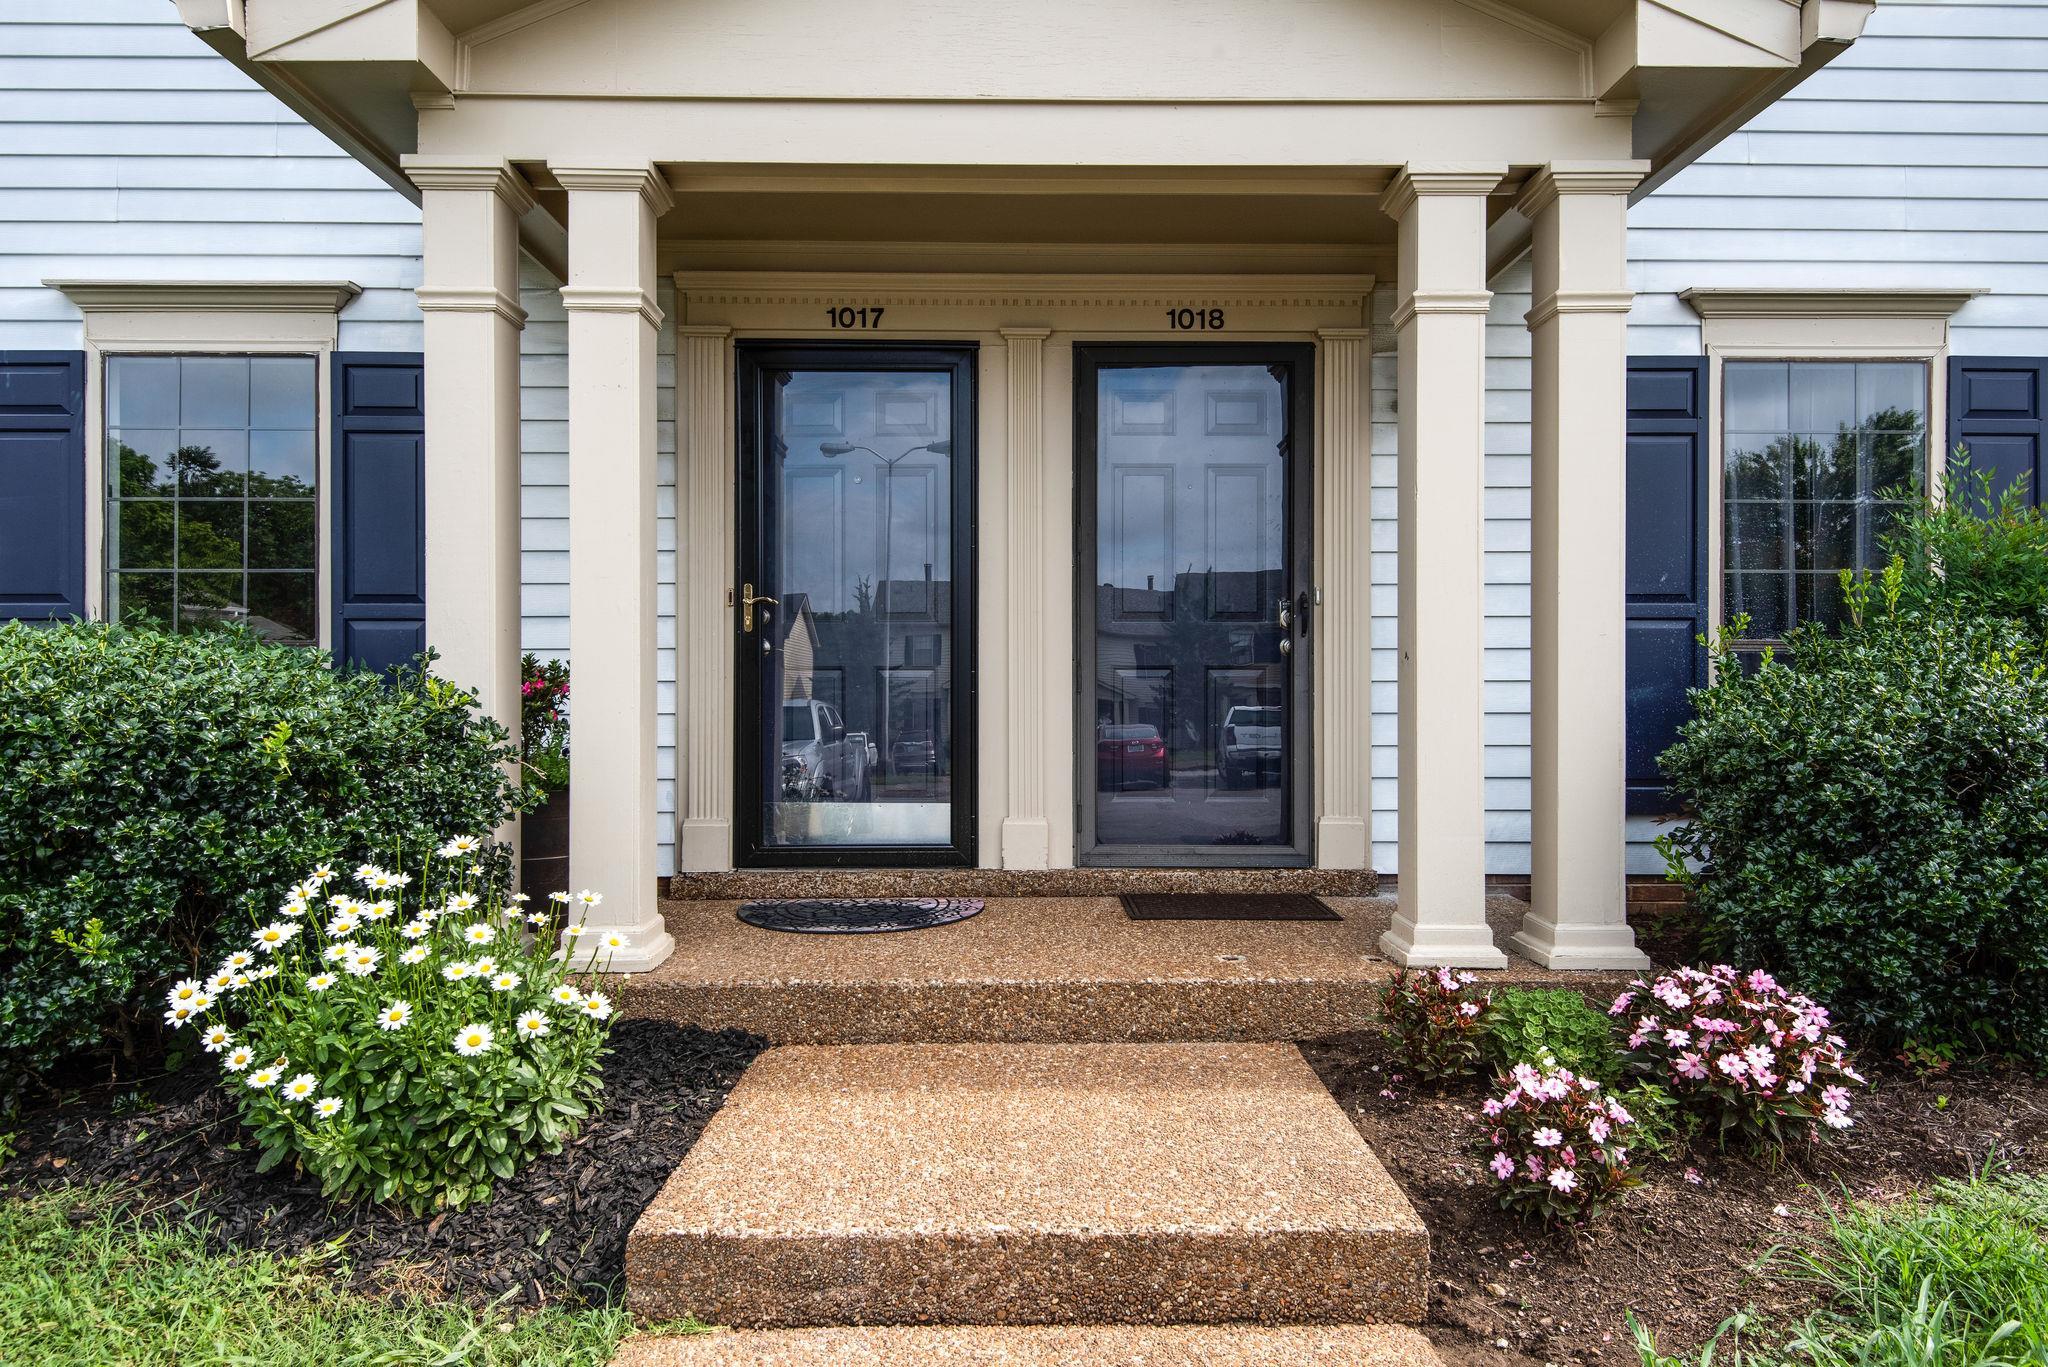 1017 Brentwood Pt, Brentwood, TN 37027 - Brentwood, TN real estate listing